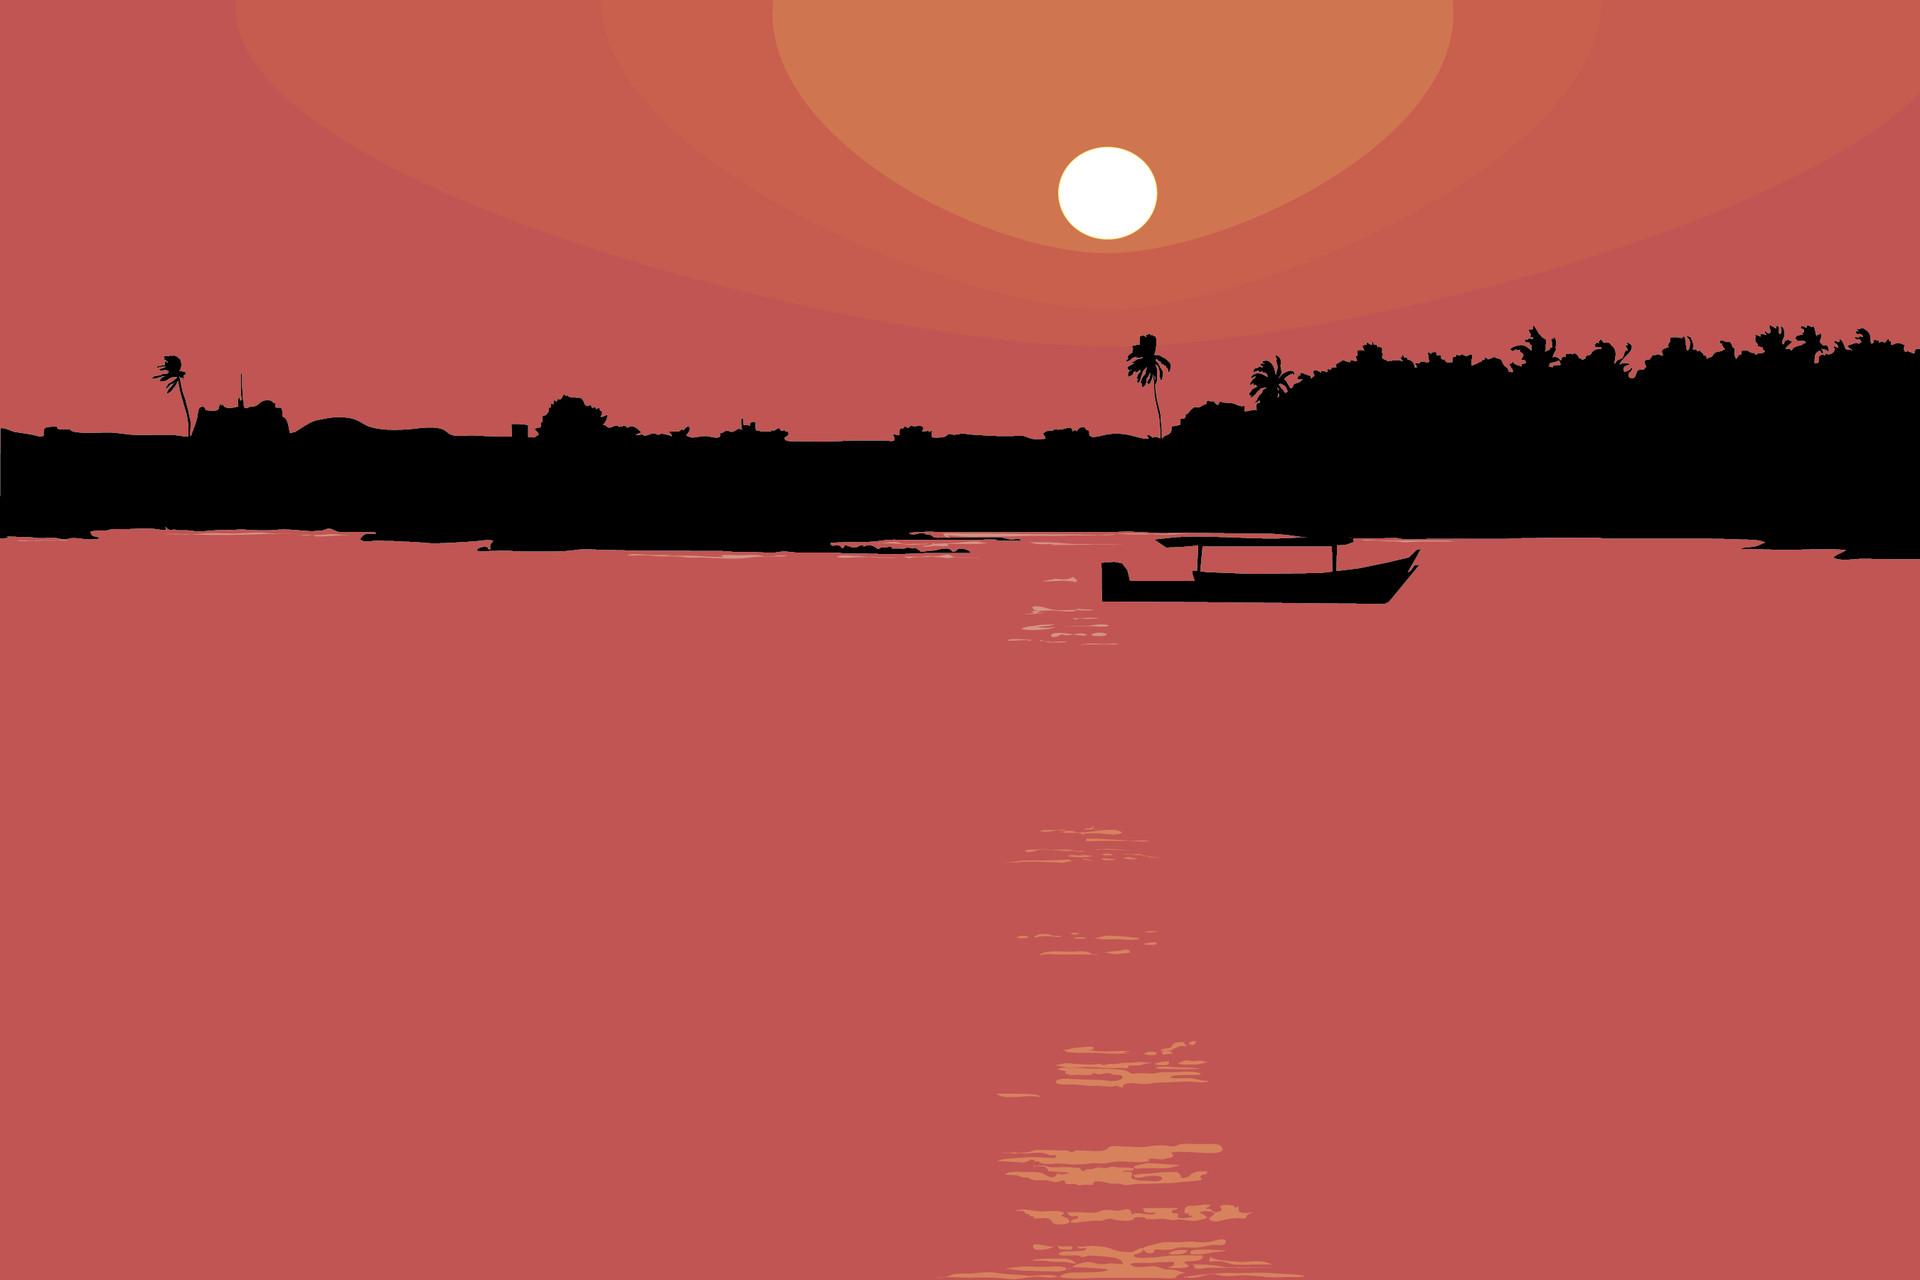 Rajesh r sawant sun set 12 x 18 01